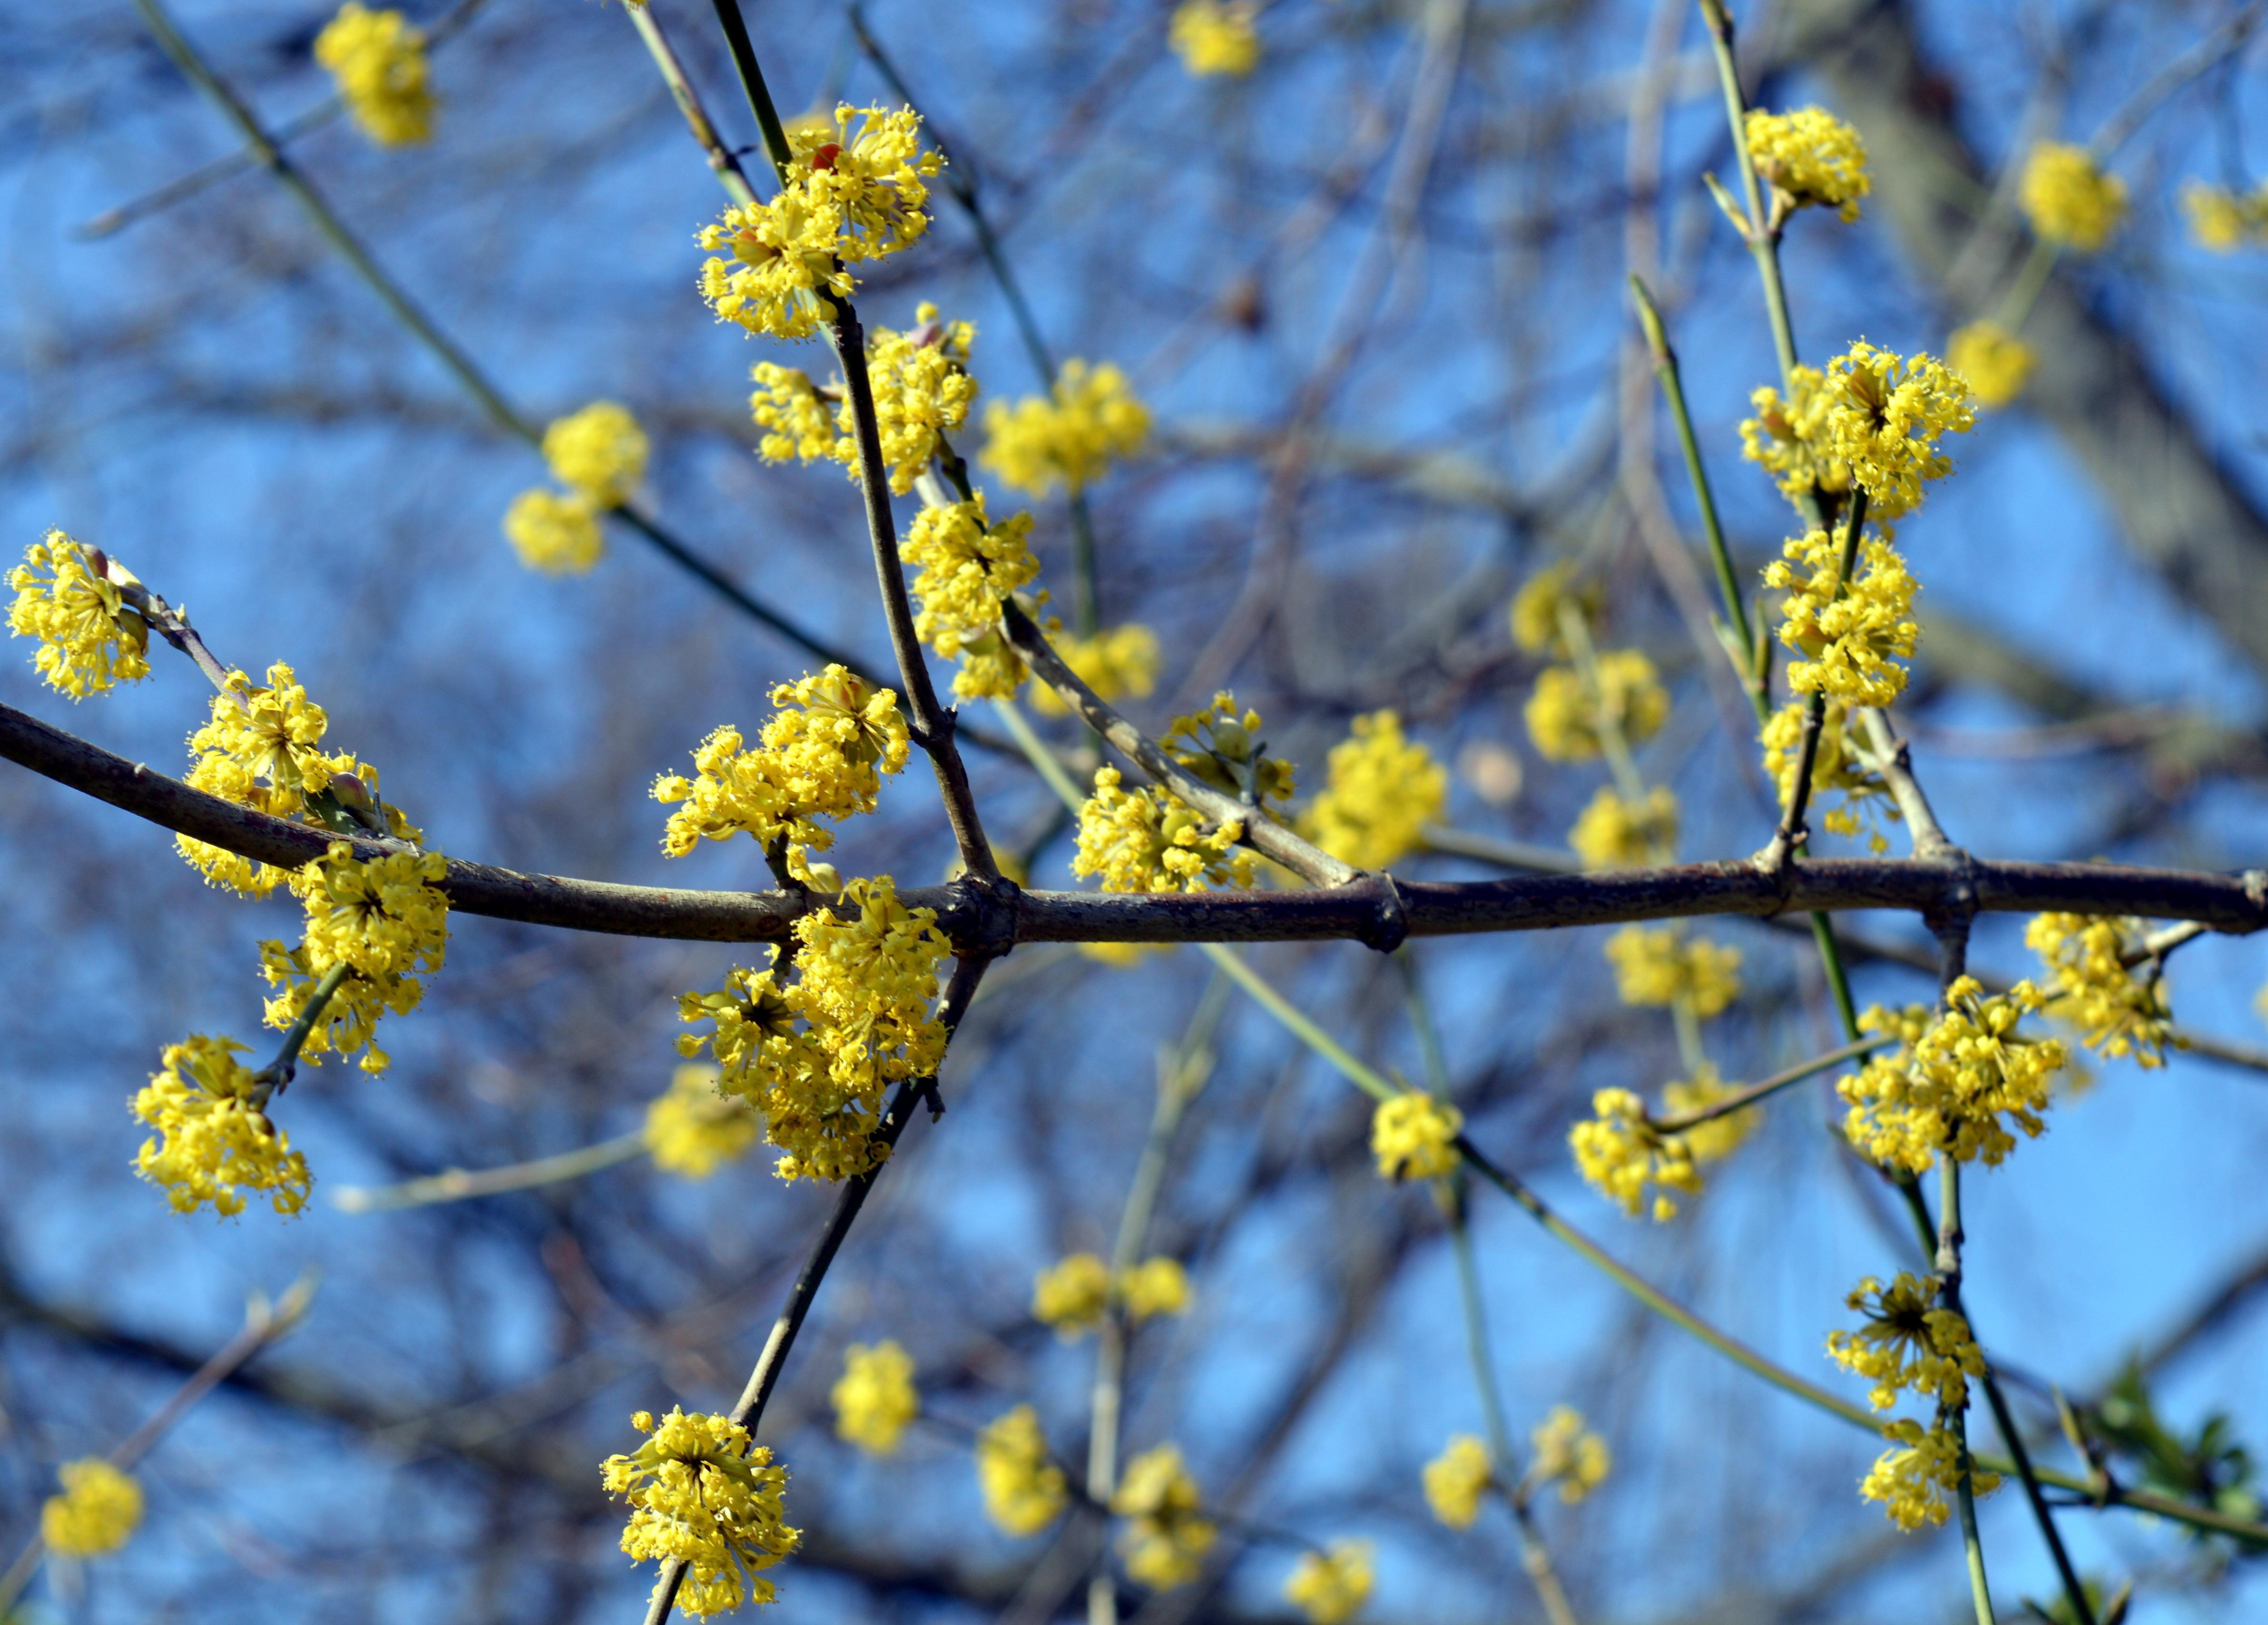 Free Images Nature Branch Blossom Sunlight Leaf Flower Food